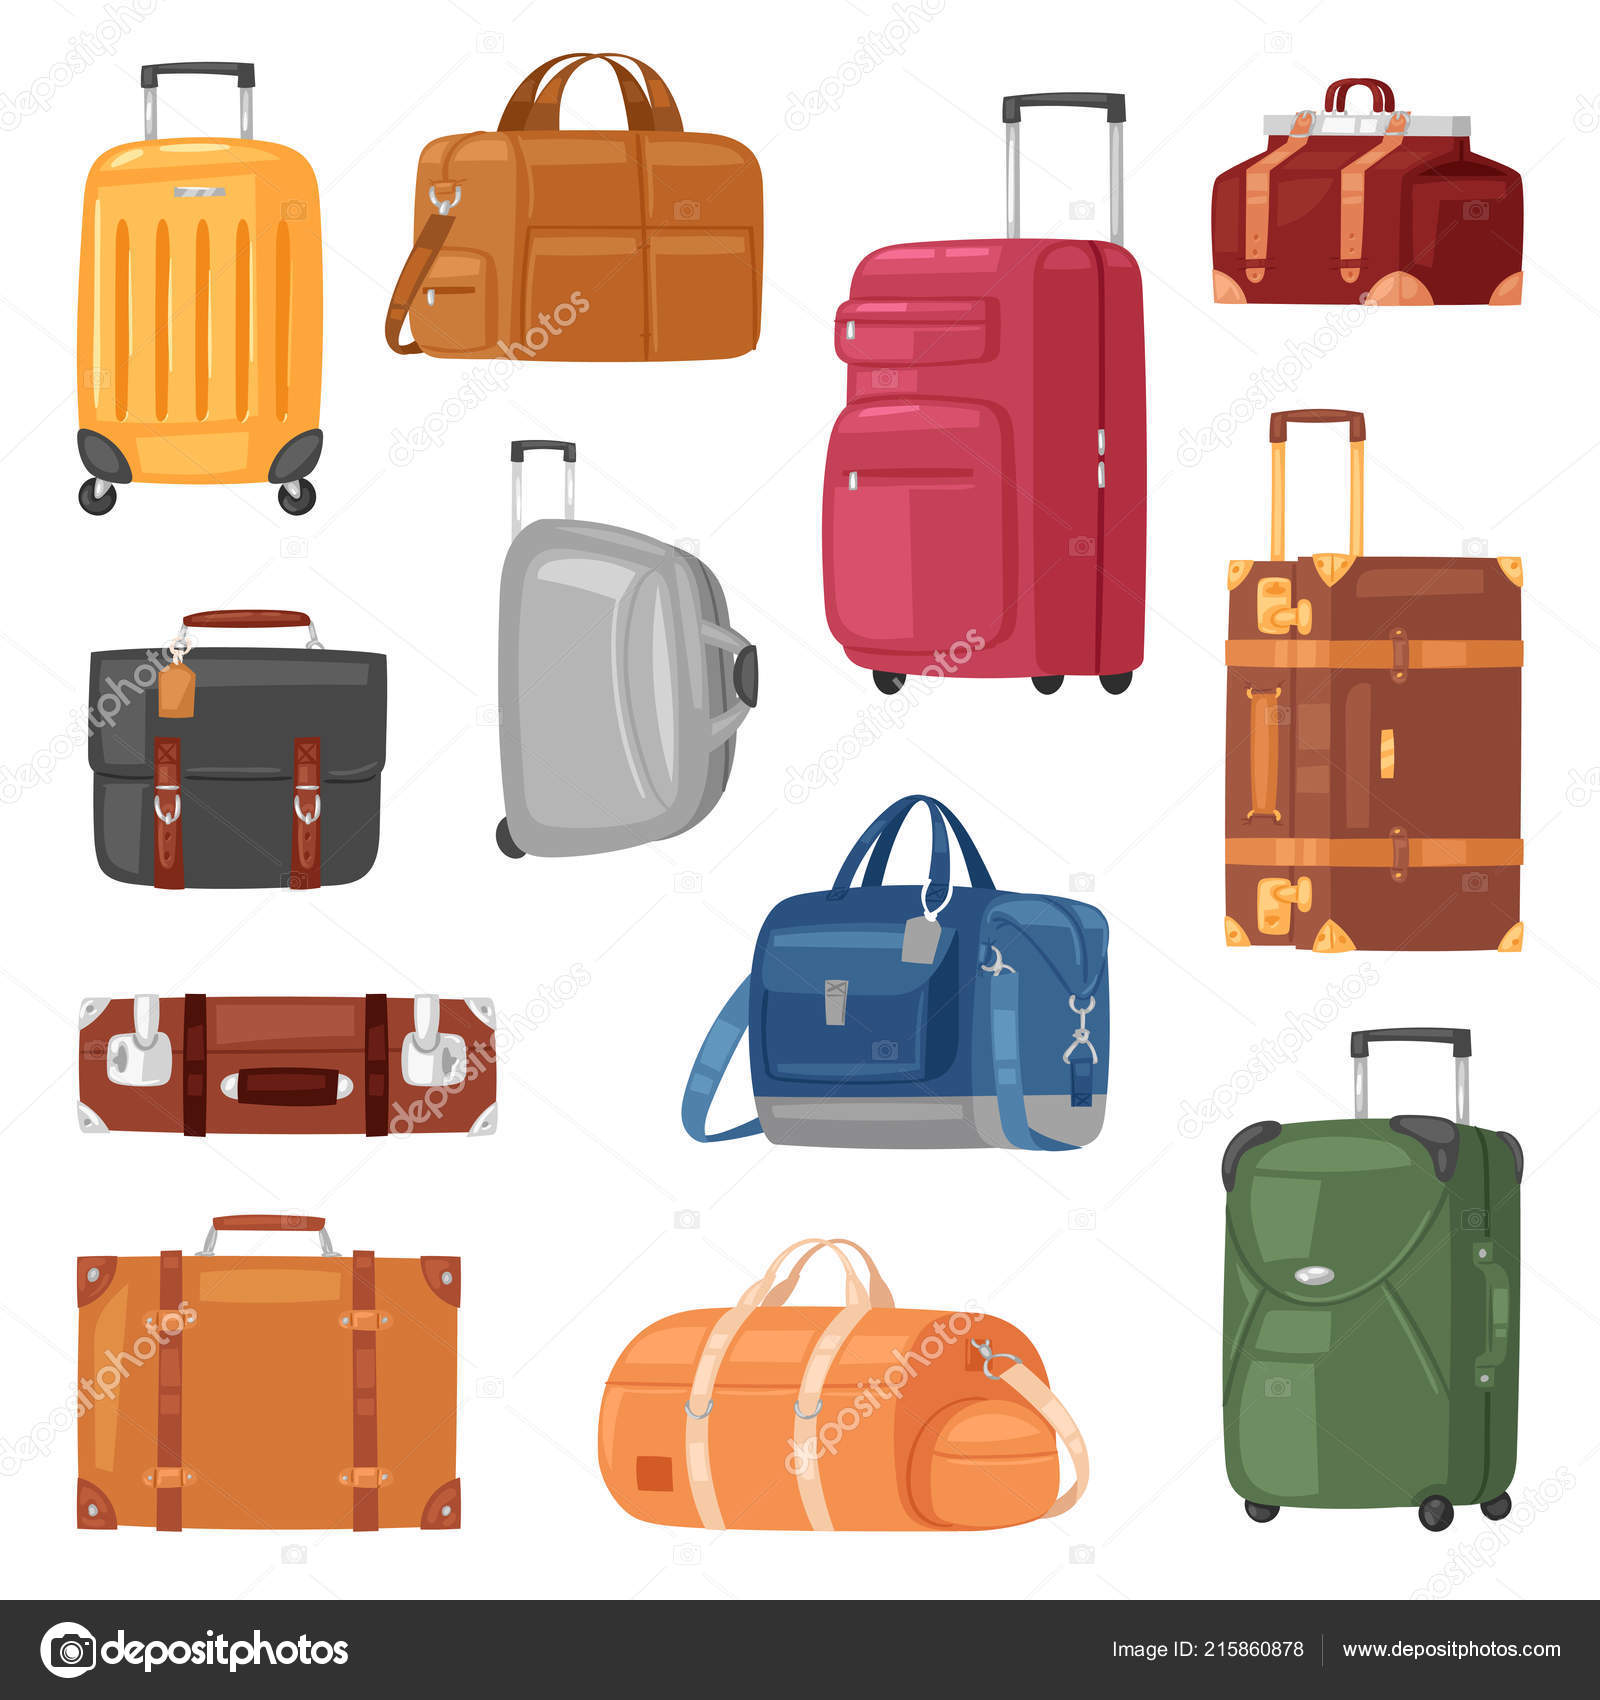 8961c2e41e Ταξιδεύουν τσάντα διάνυσμα αποσκευών βαλίτσα για ταξίδι διακοπές τουρισμός  εικονογράφηση σετ ταξιδιού αποσκευών και περιοδεία περιπέτεια